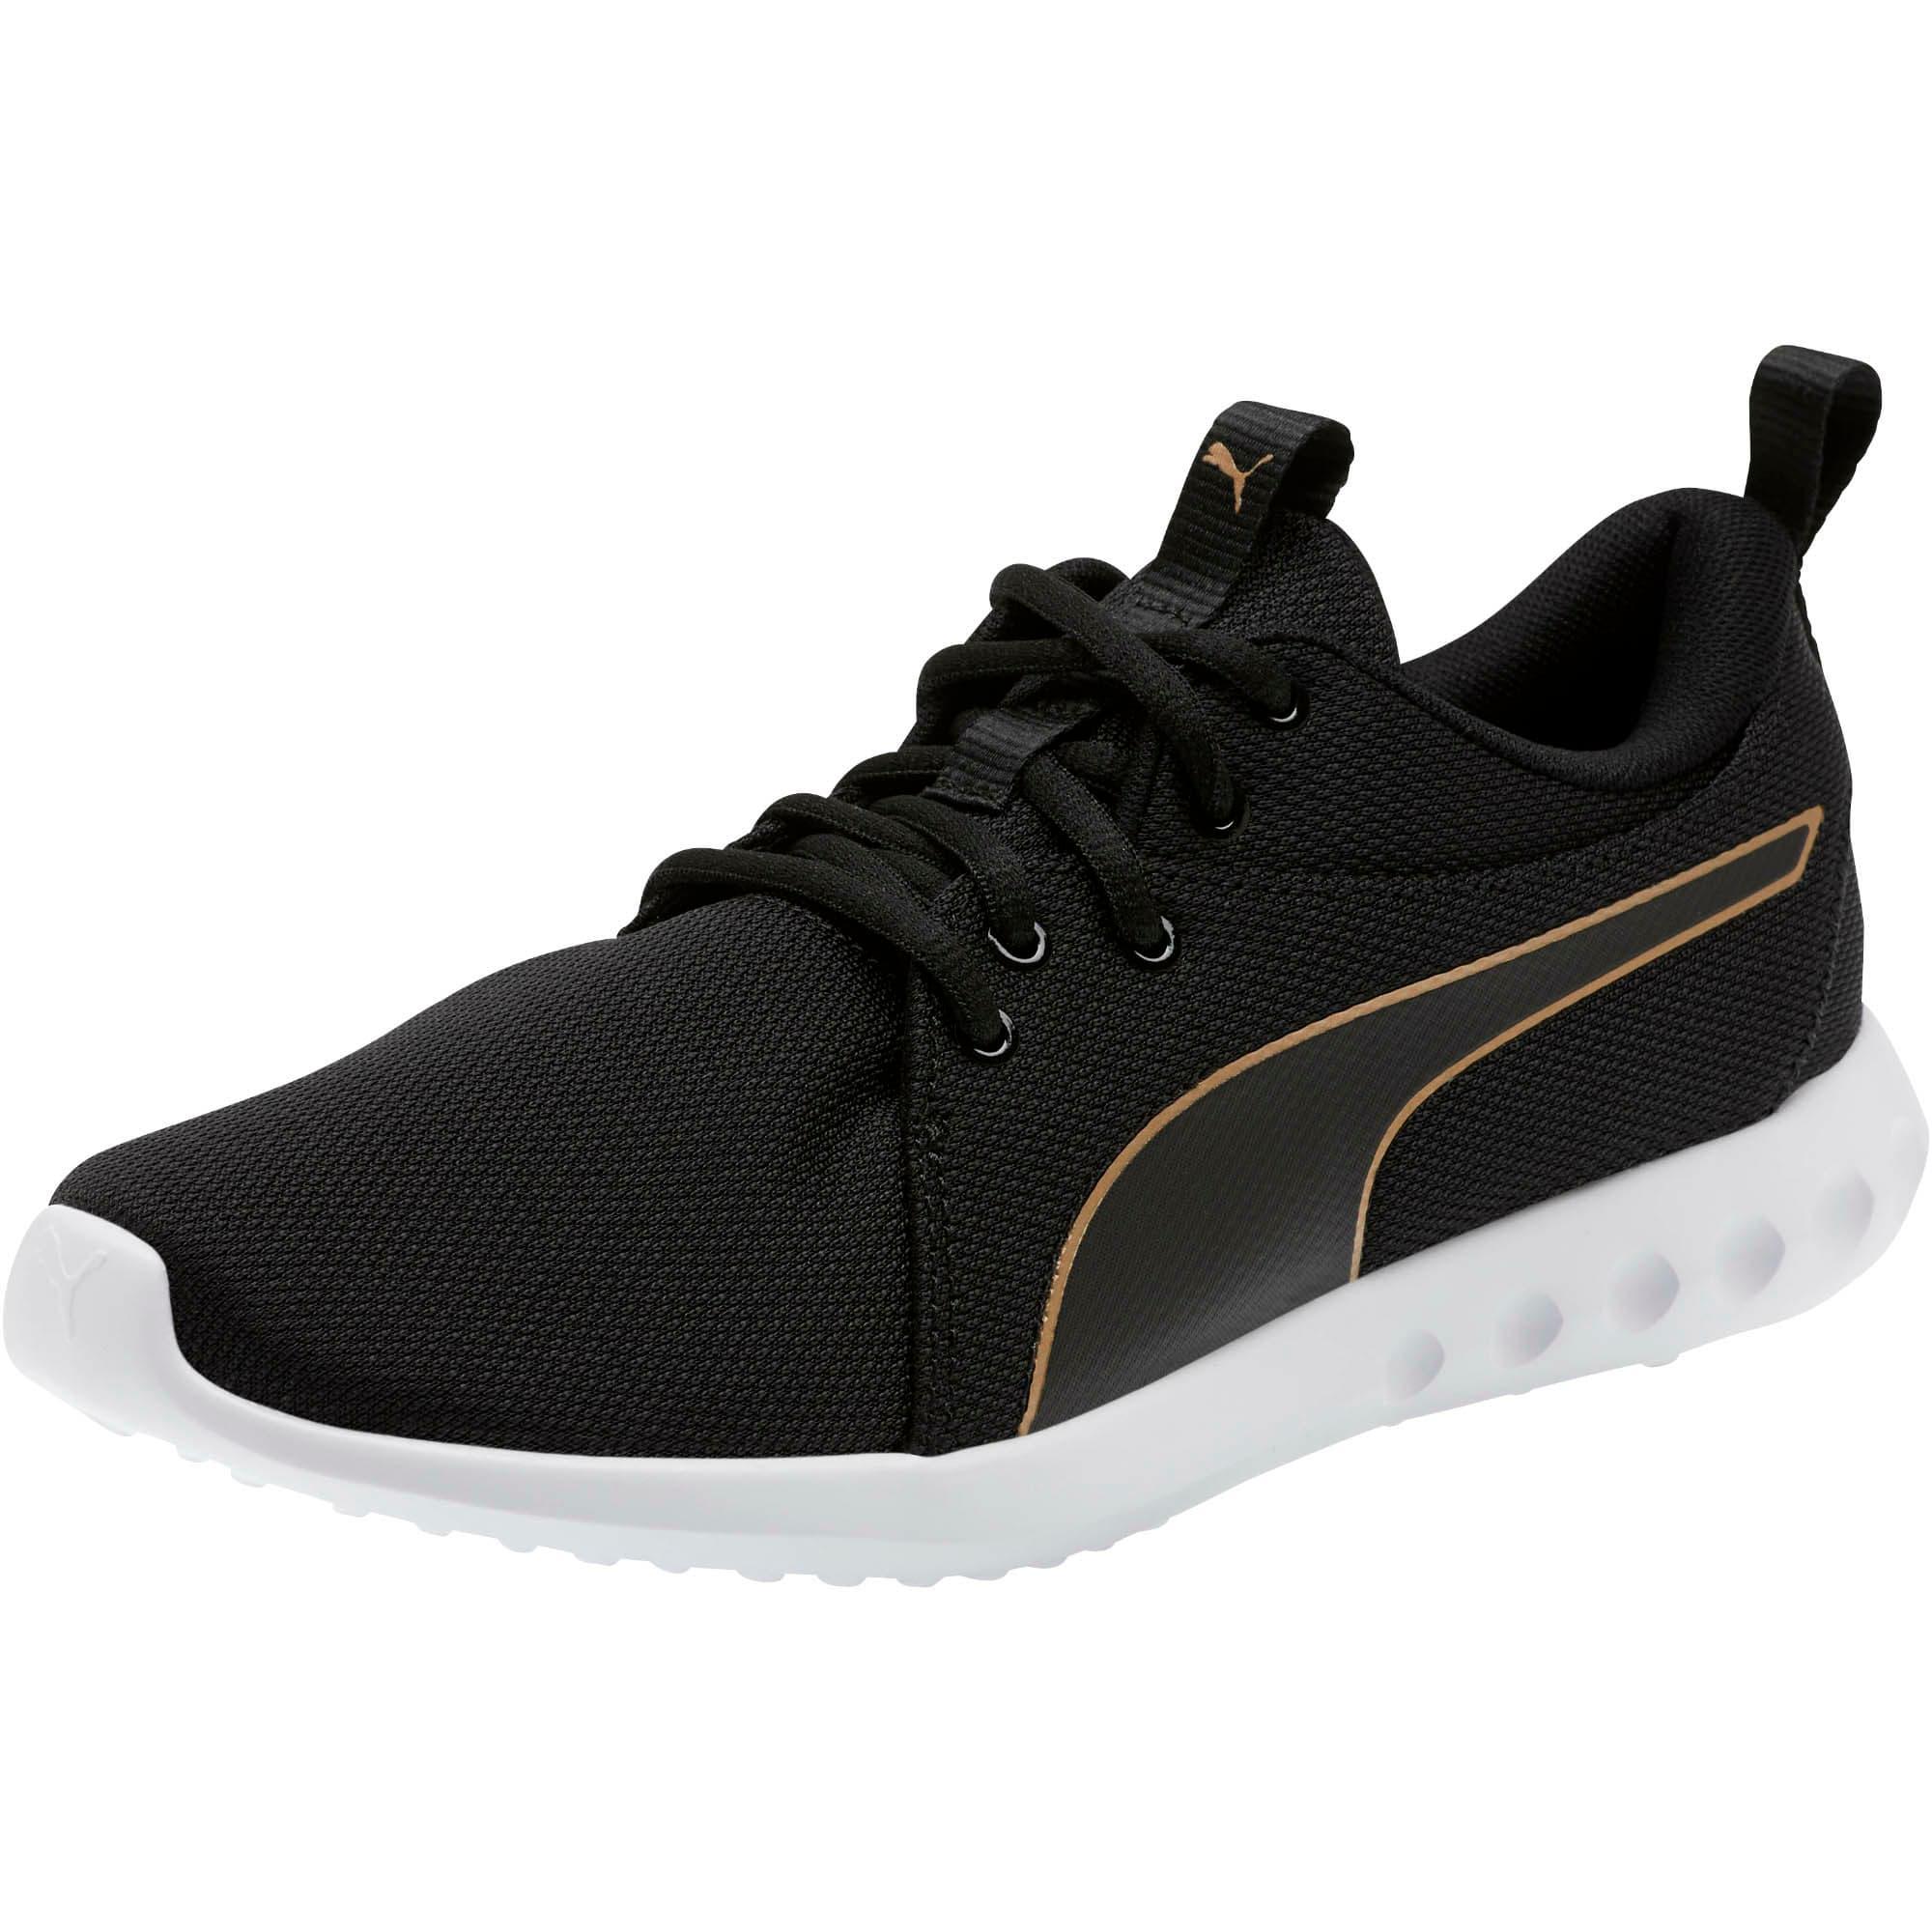 Thumbnail 1 of Carson 2 Cosmo Women's Running Shoes, Puma Black-Metallic Gold, medium